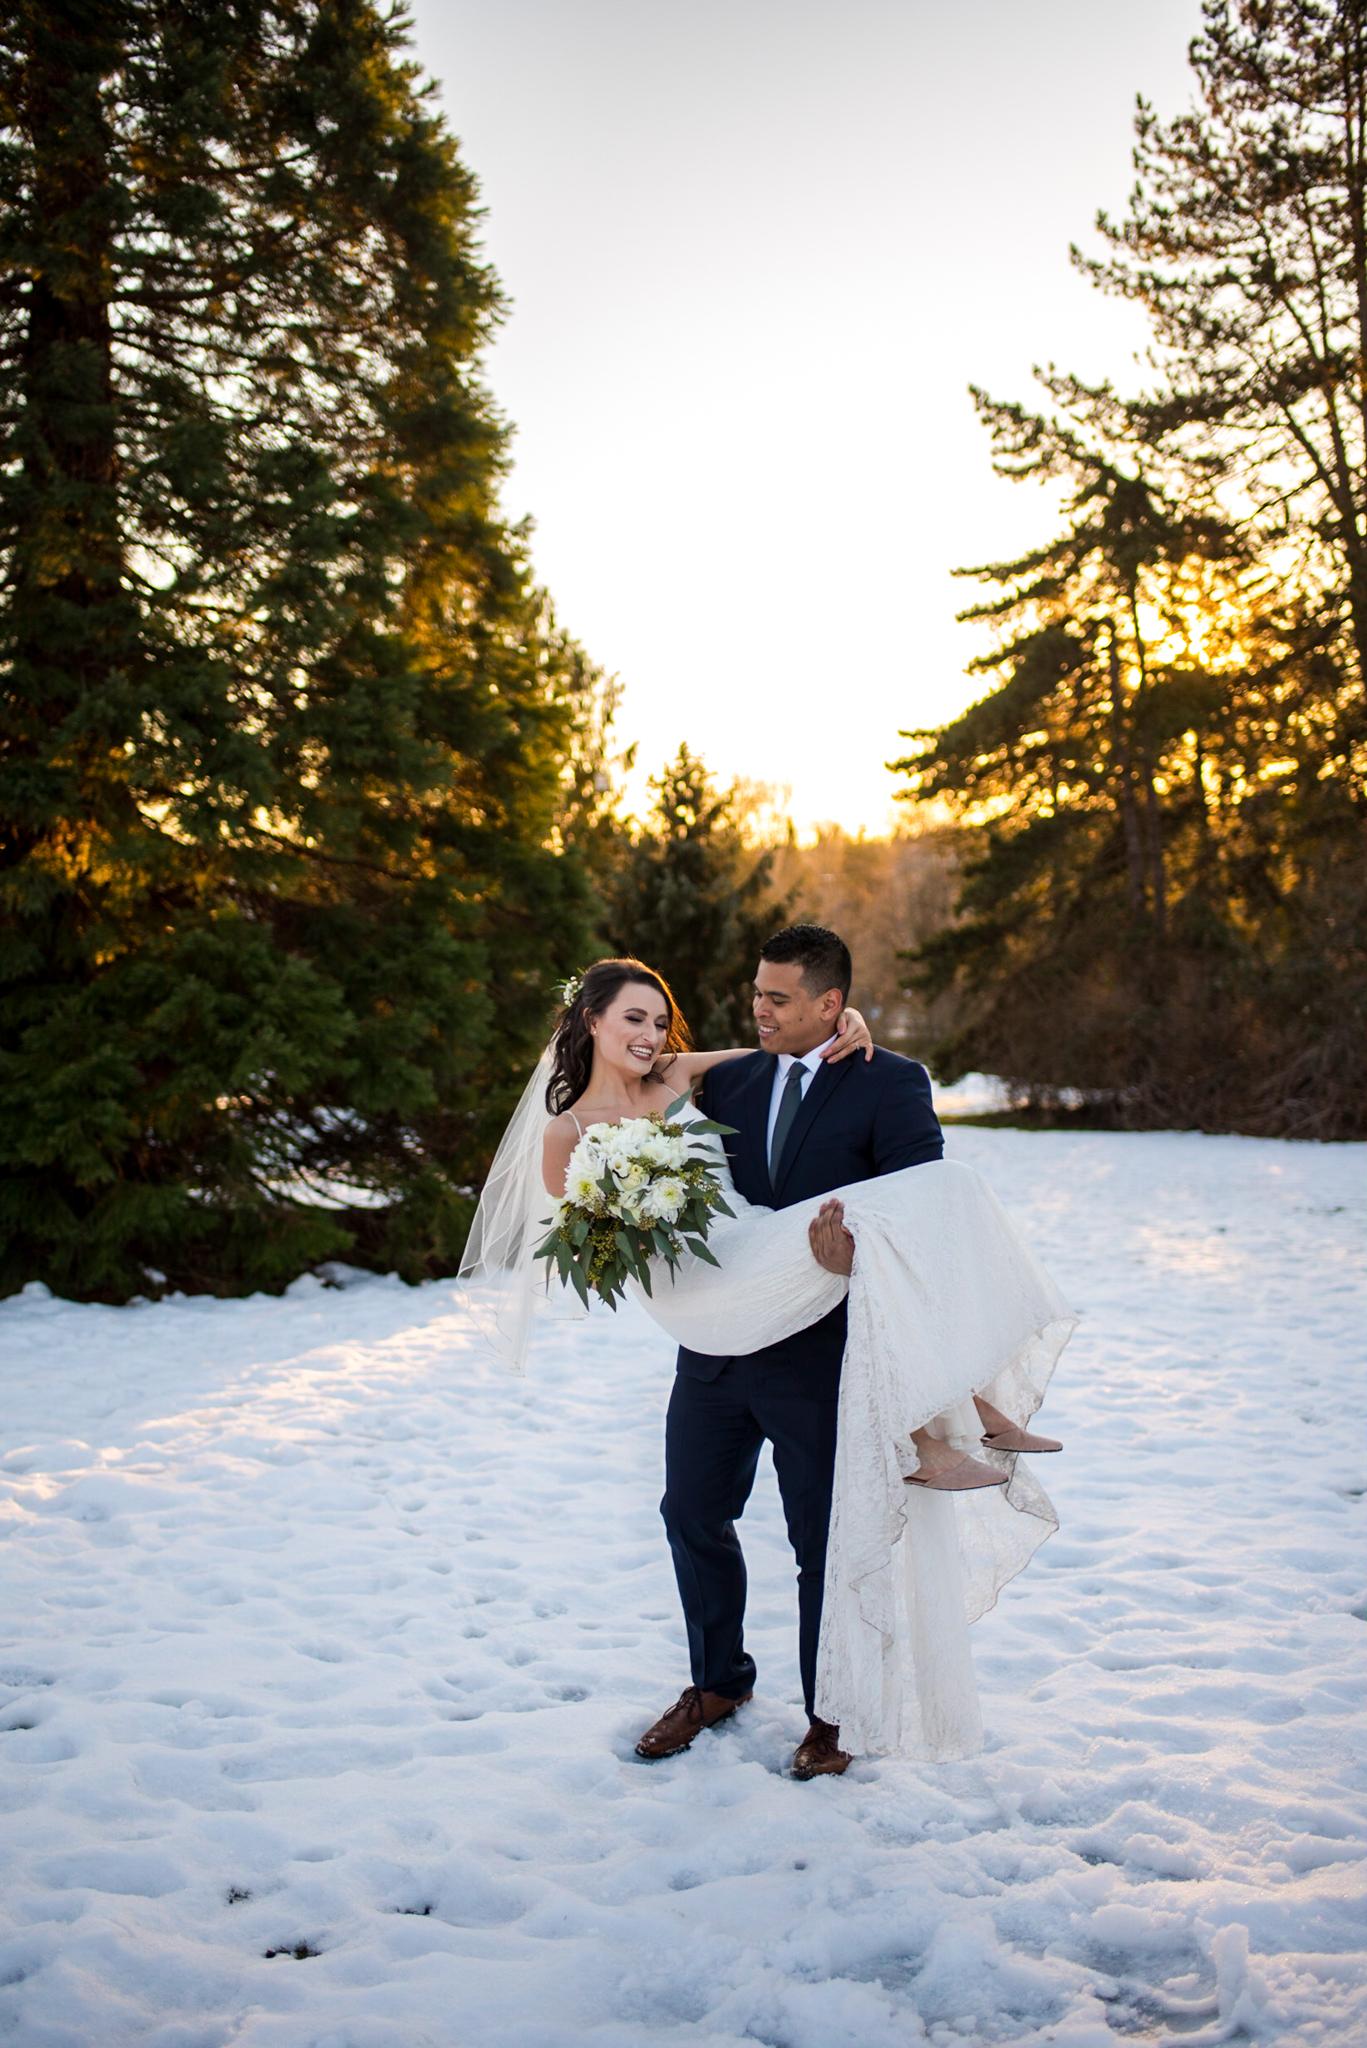 Bride and Groom in the snow at Queen Elizabeth Park